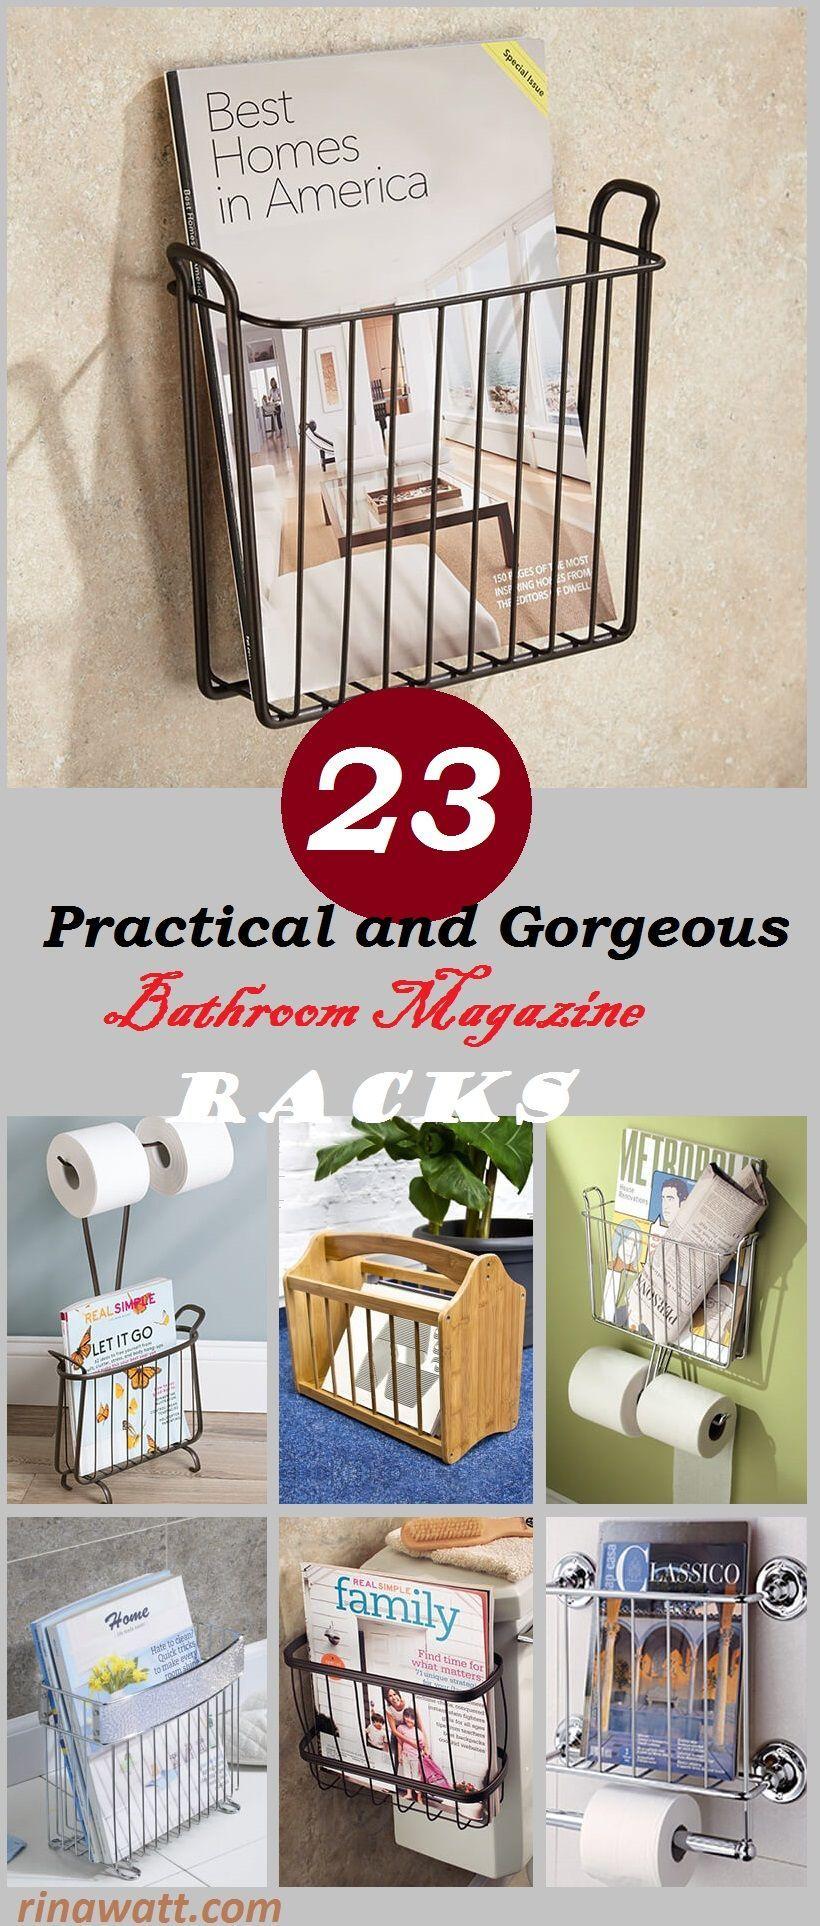 23 Trending Bathroom Magazine Racks 1 Bronze Bathroom Magazine Holder 2 Bronze Over Th Gorgeous Bathroom Industrial Bathroom Design Industrial Style Bathroom